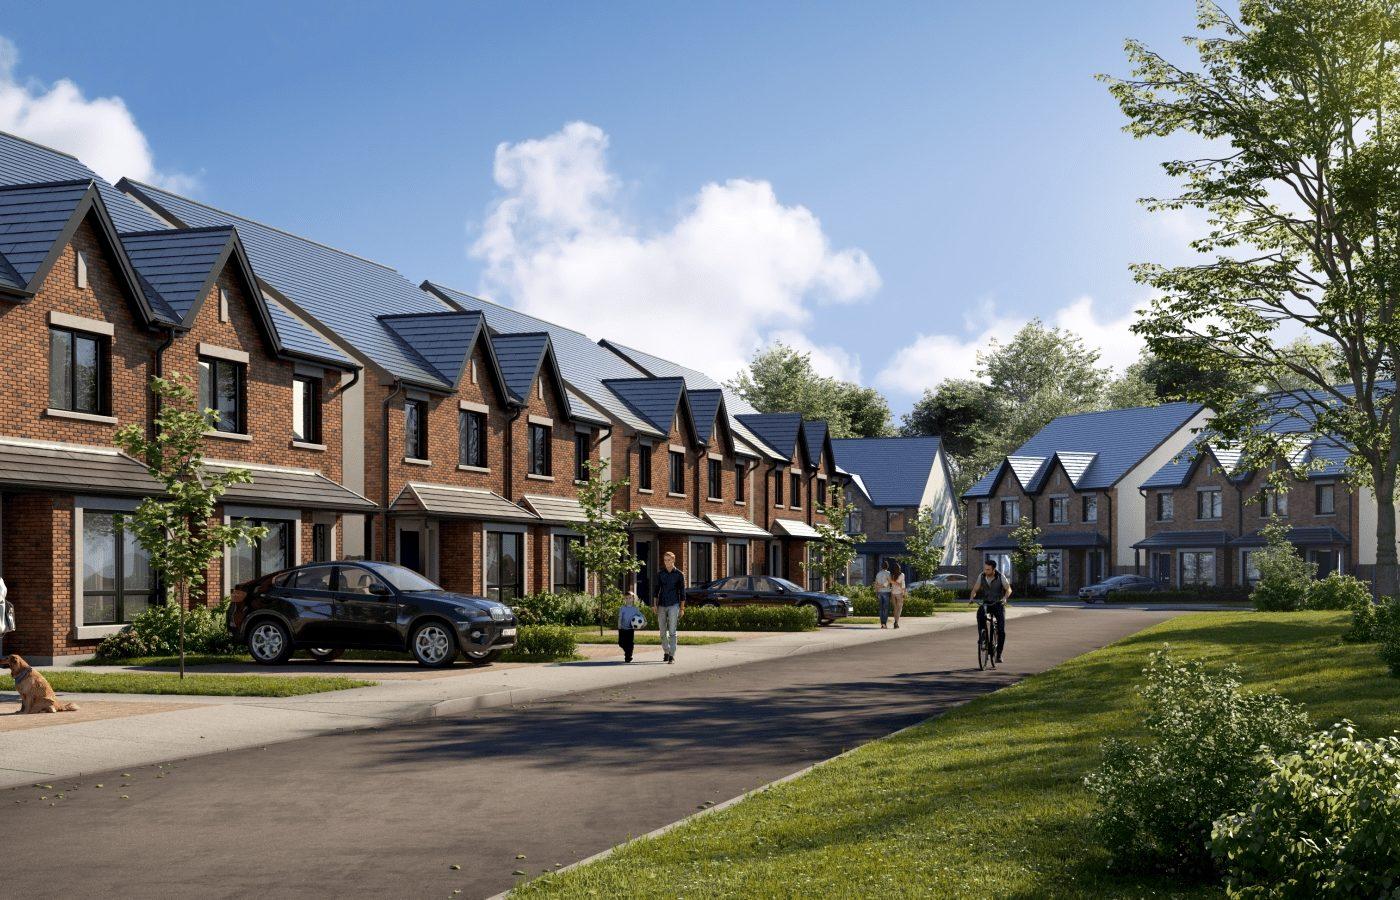 Housing Estate RESIZED